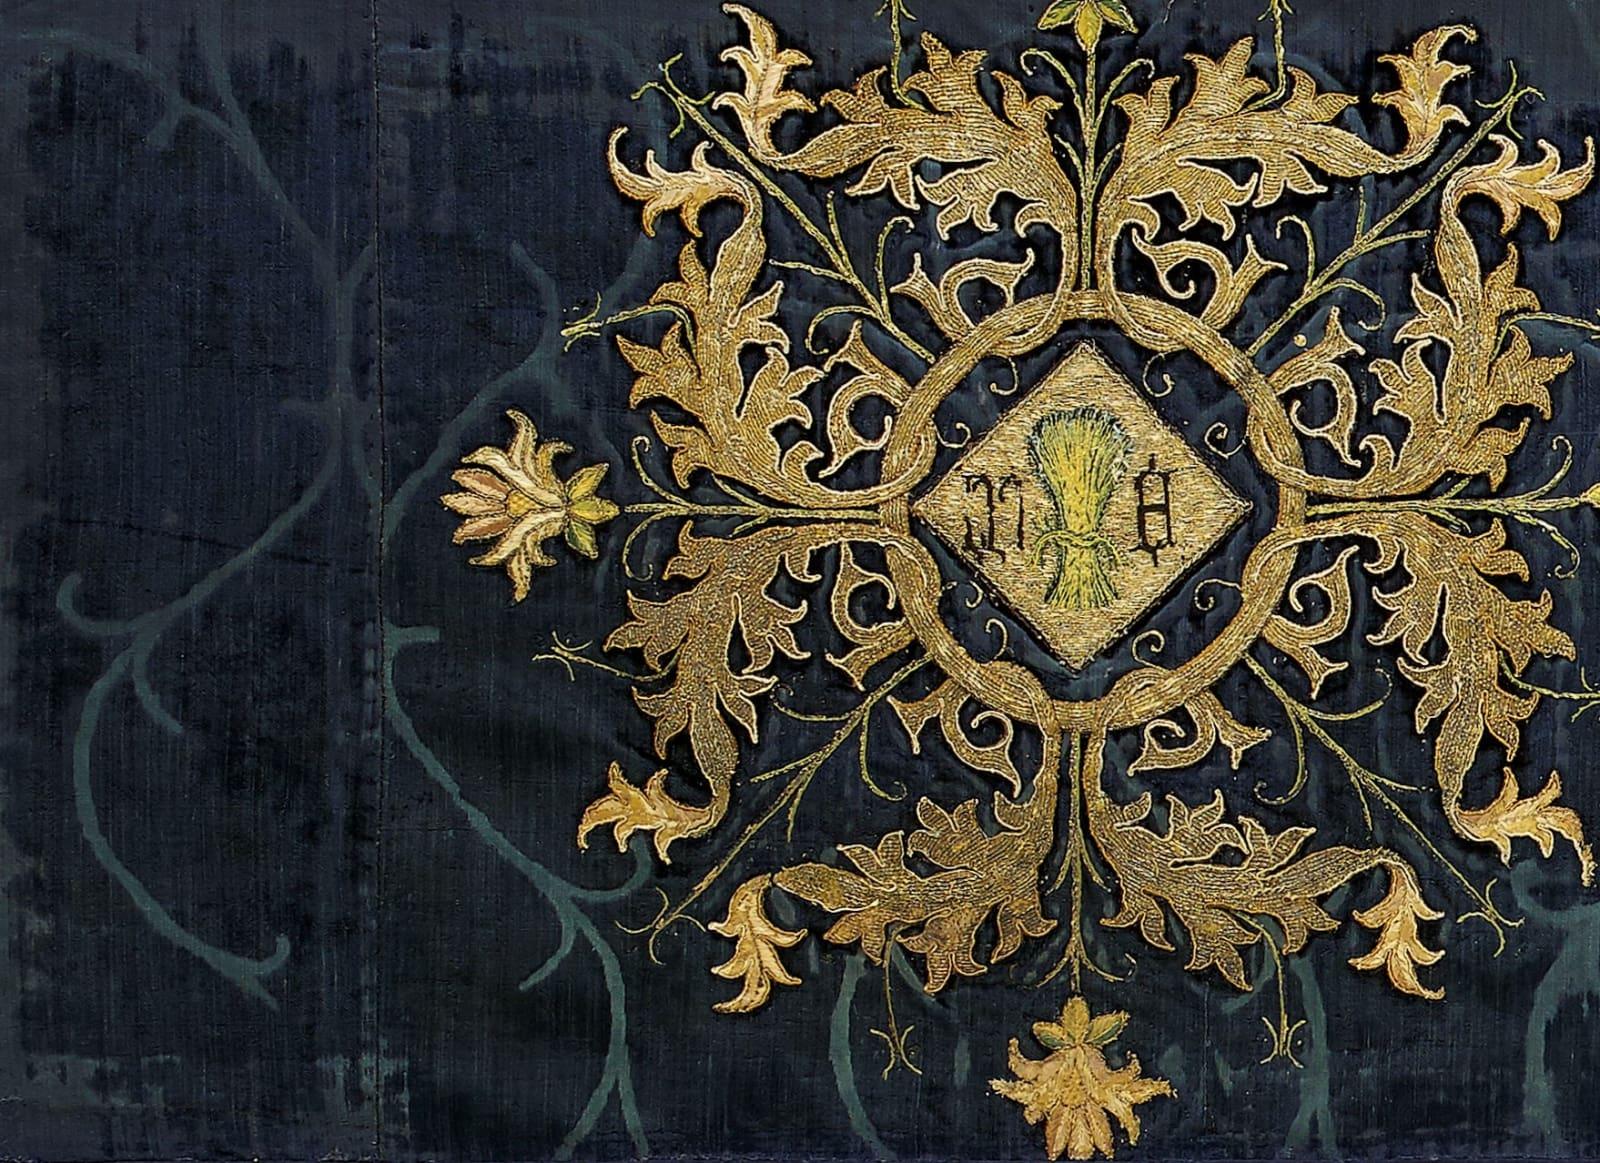 late medieval and renaissance textiles sam fogg